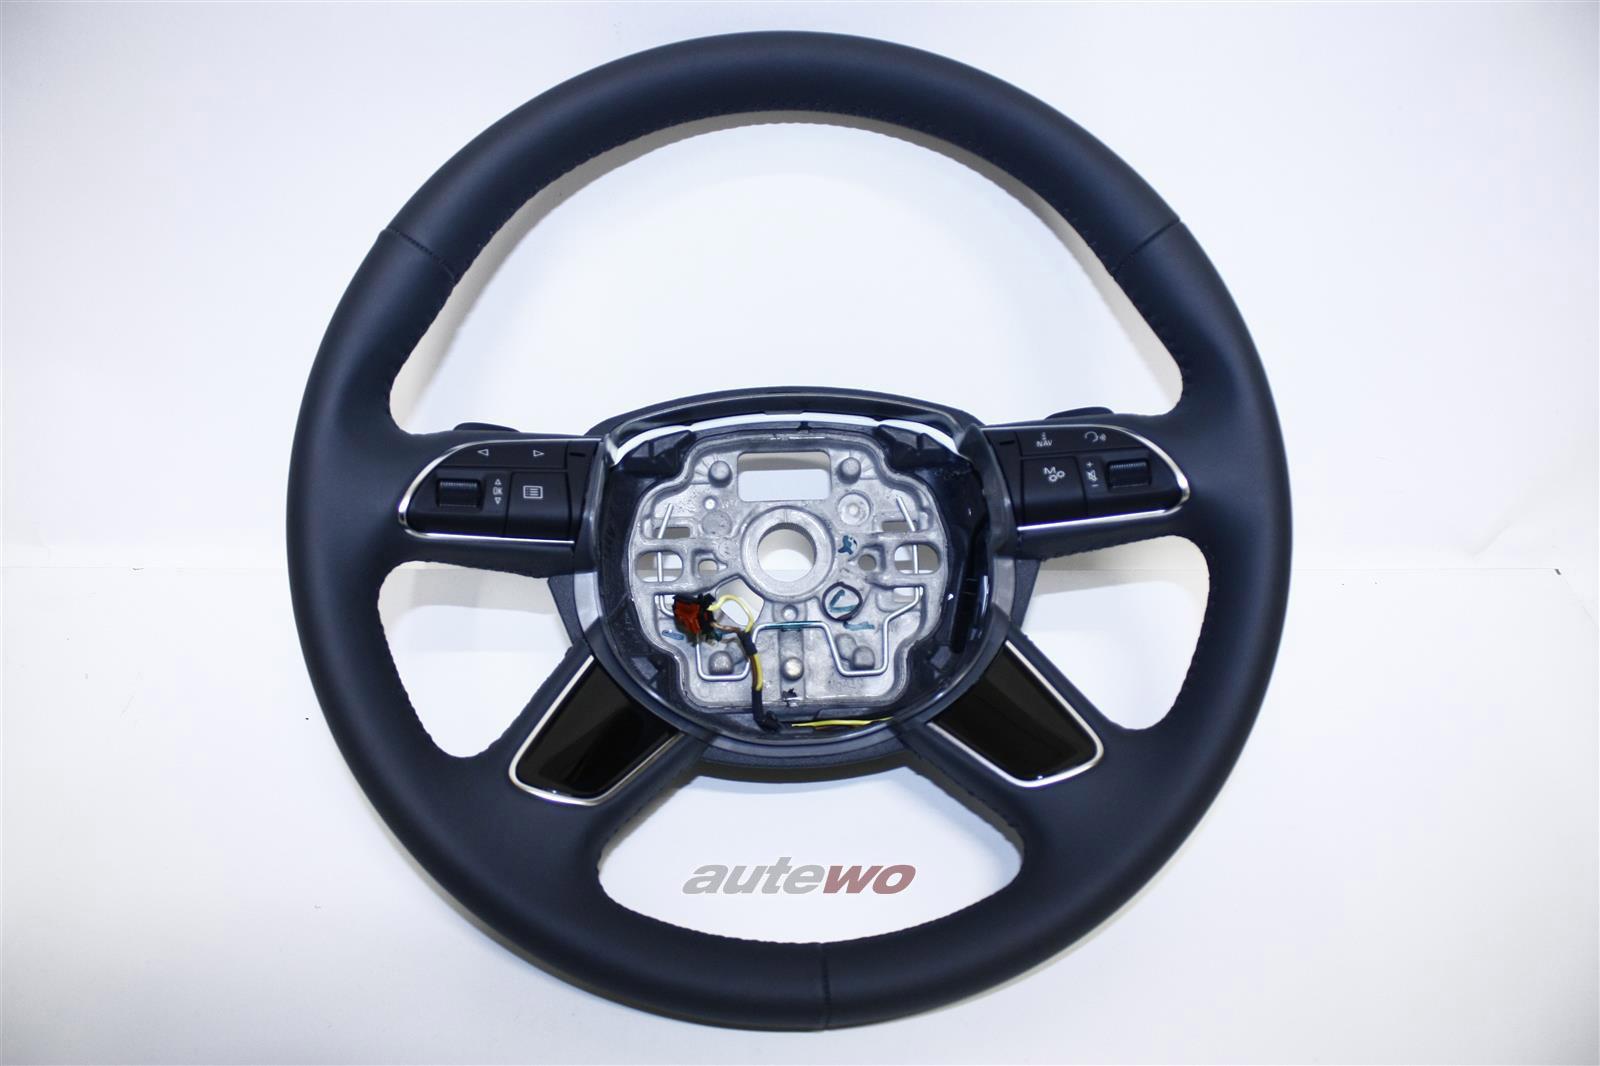 4H0419091AA NEU Audi A8 D4 Leder-Lenkrad beheizbar DF9 granit grau